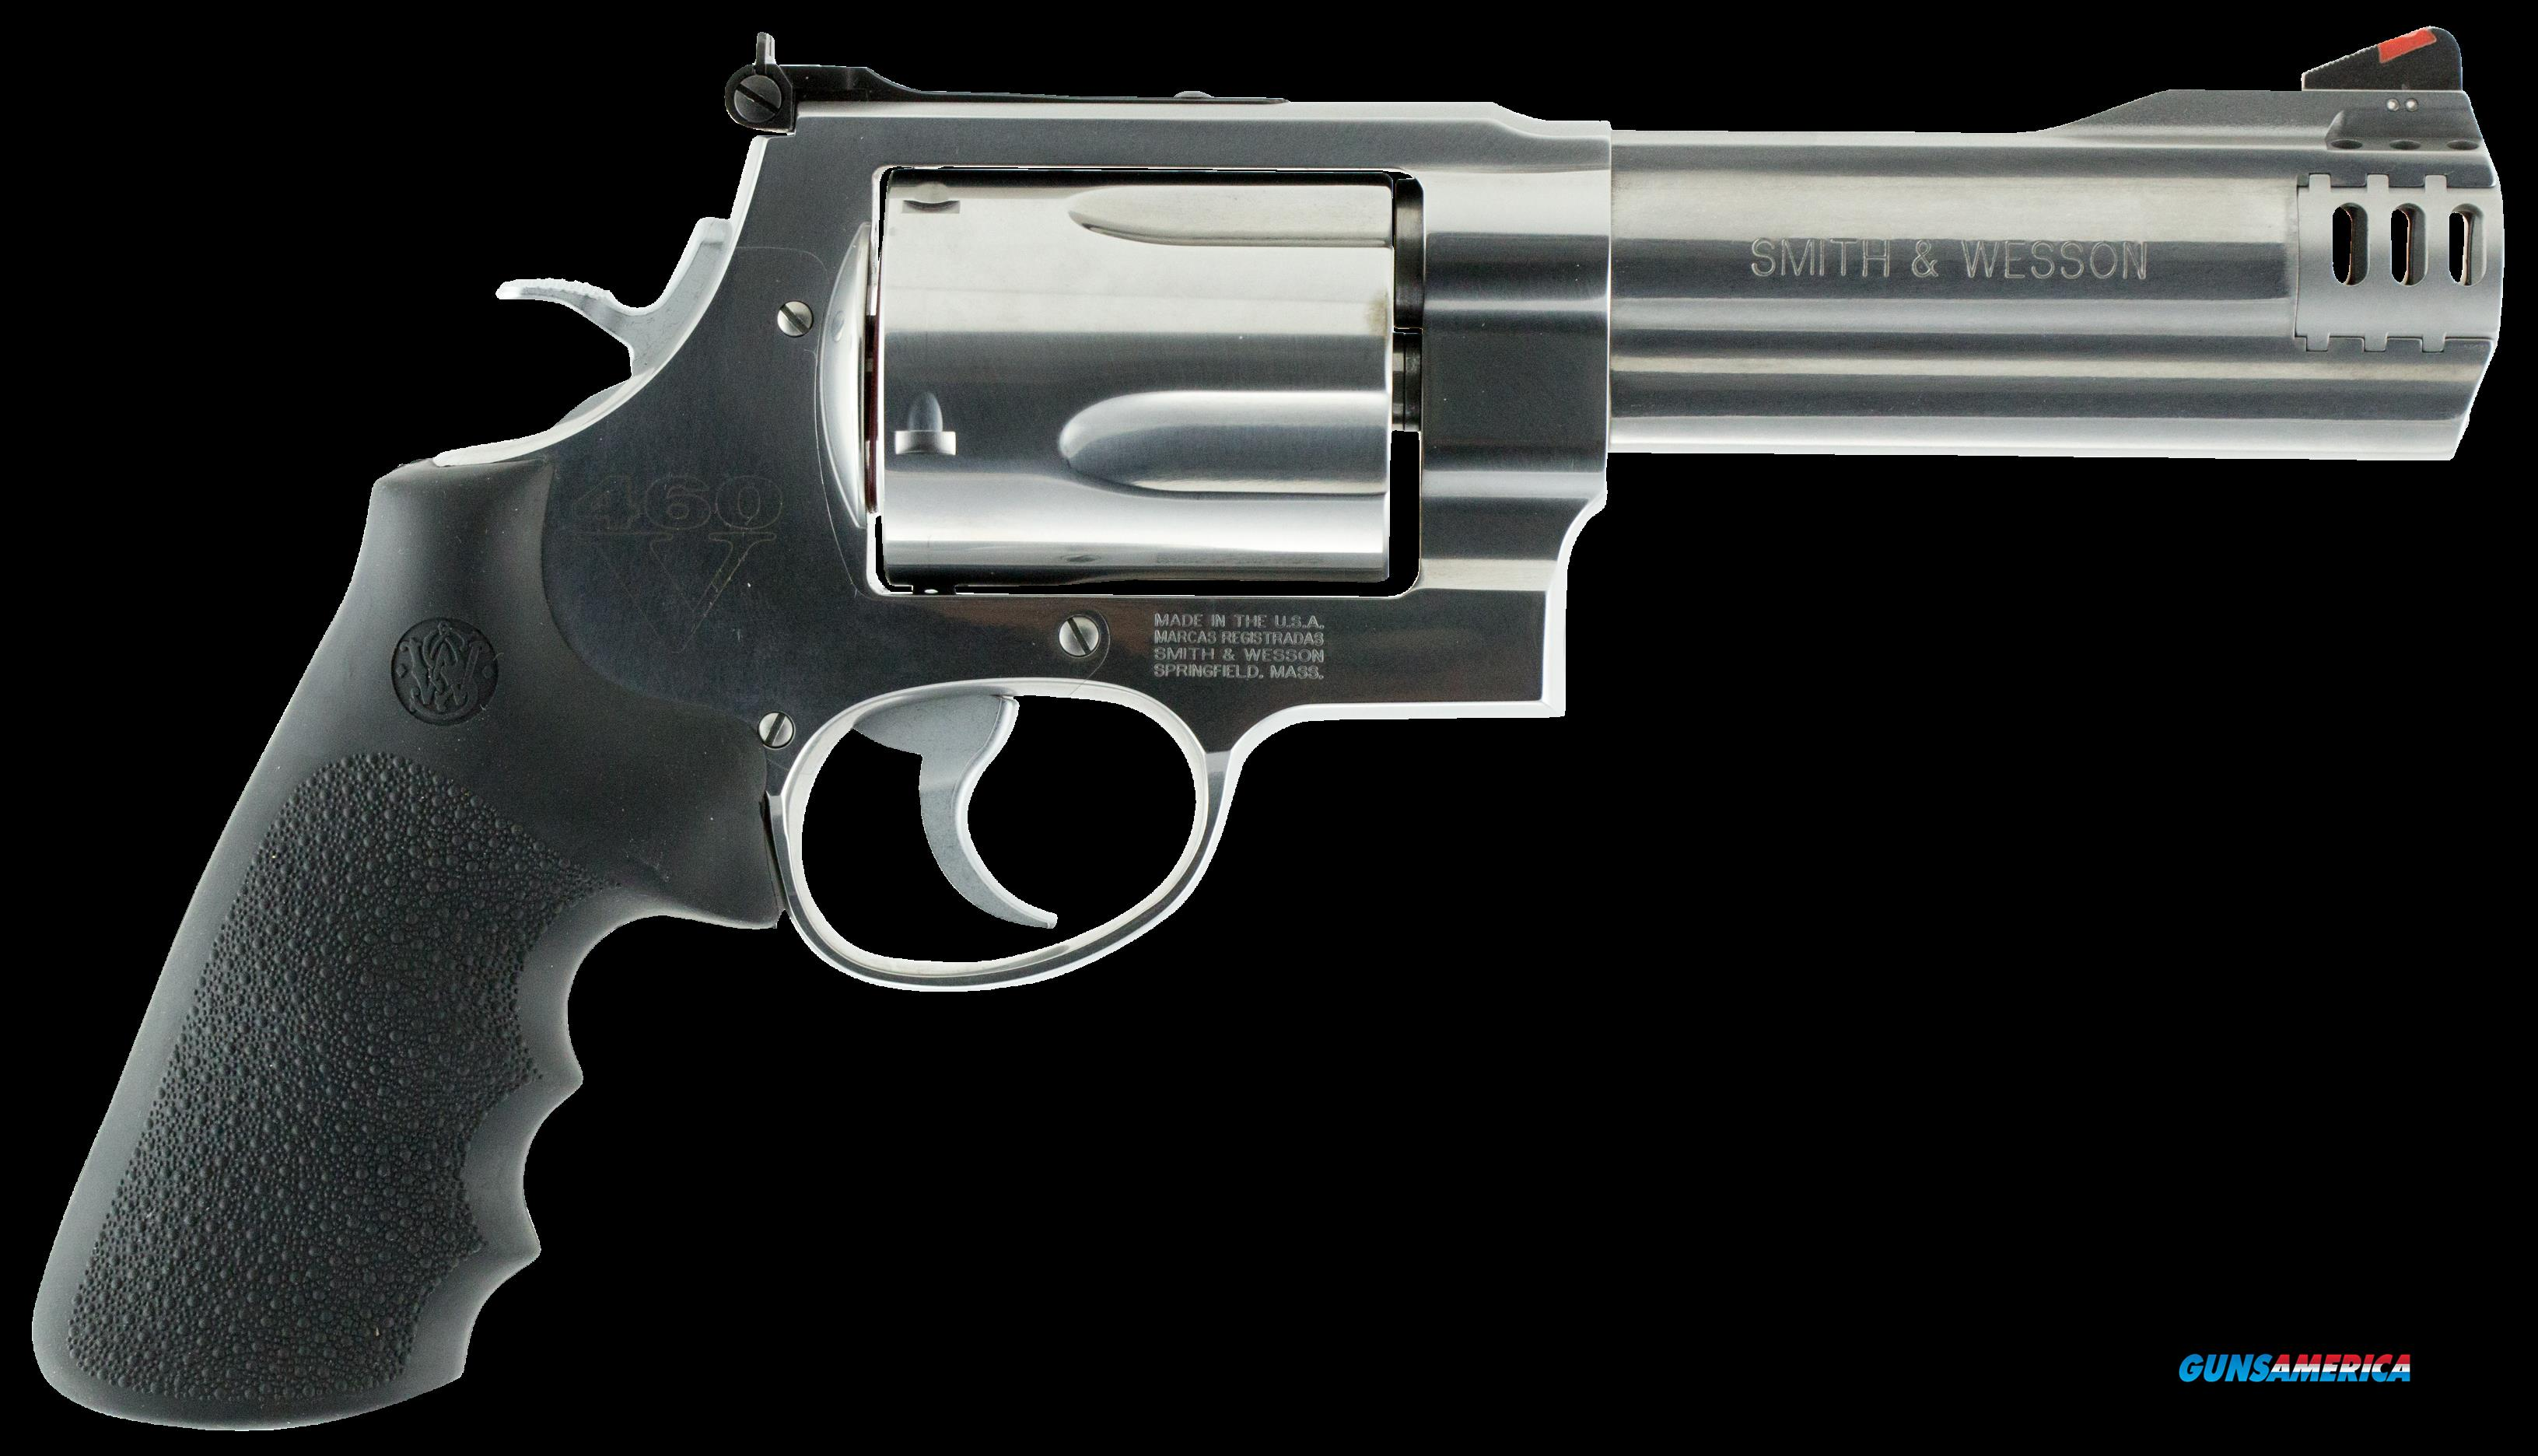 Smith & Wesson 460, S&w M460xvr   163465 460 5in Rr As      Ss  Guns > Pistols > 1911 Pistol Copies (non-Colt)